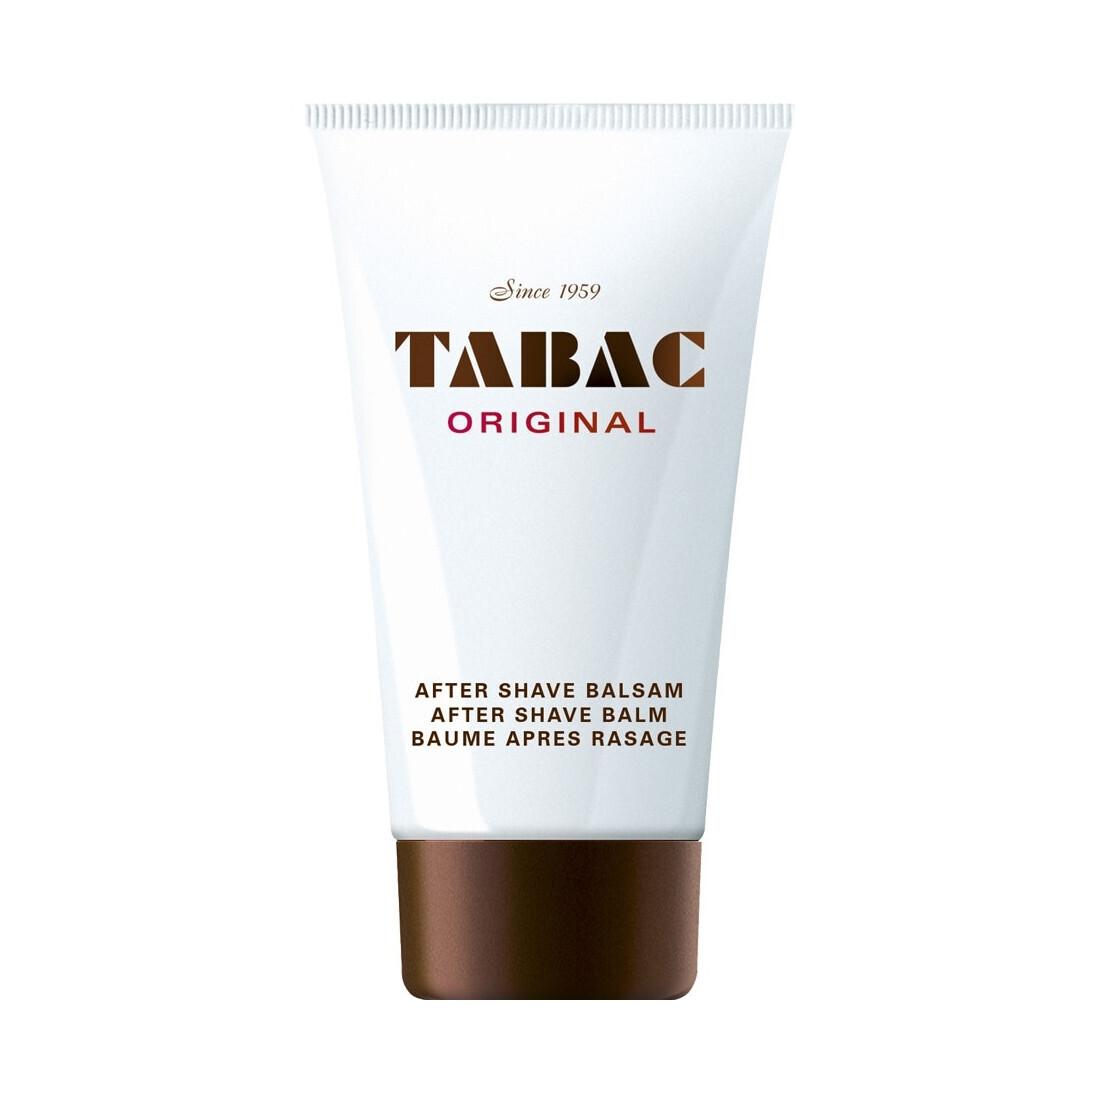 Tabac Original After Shave Balm - Бальзам после бритья 75мл